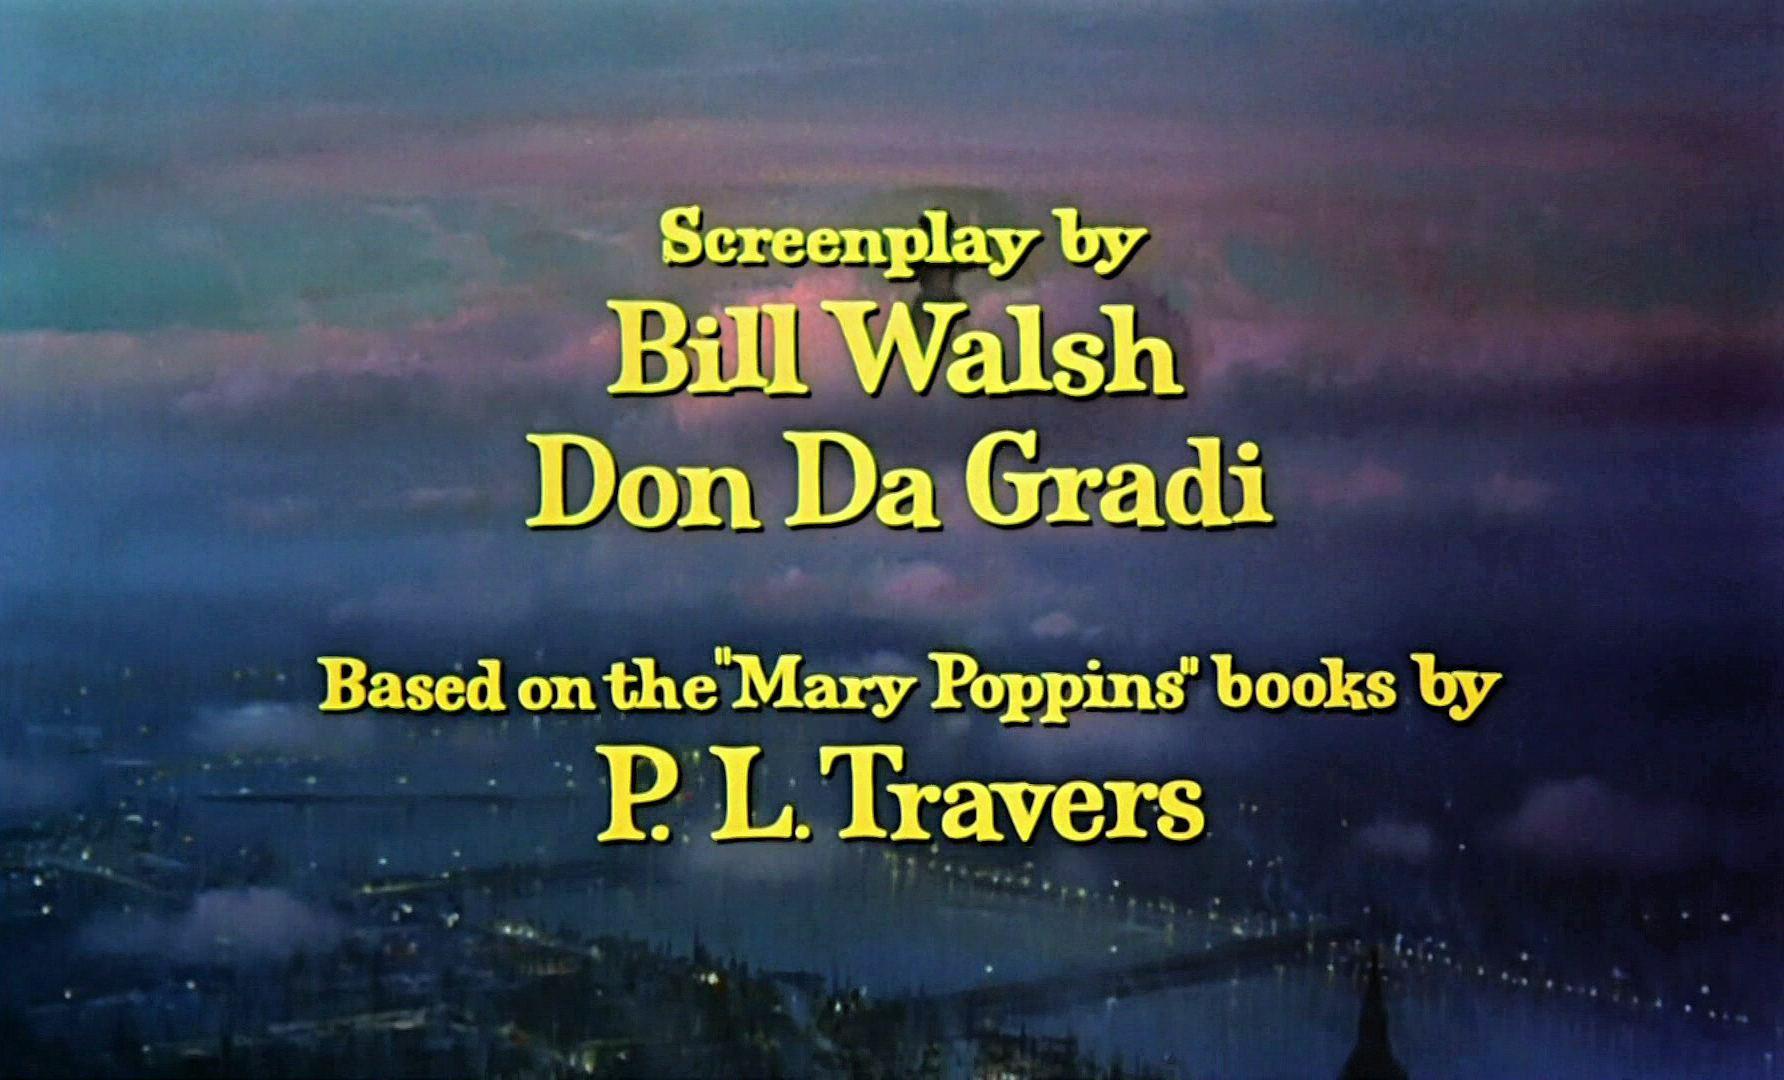 Mary Poppins (1964 film)